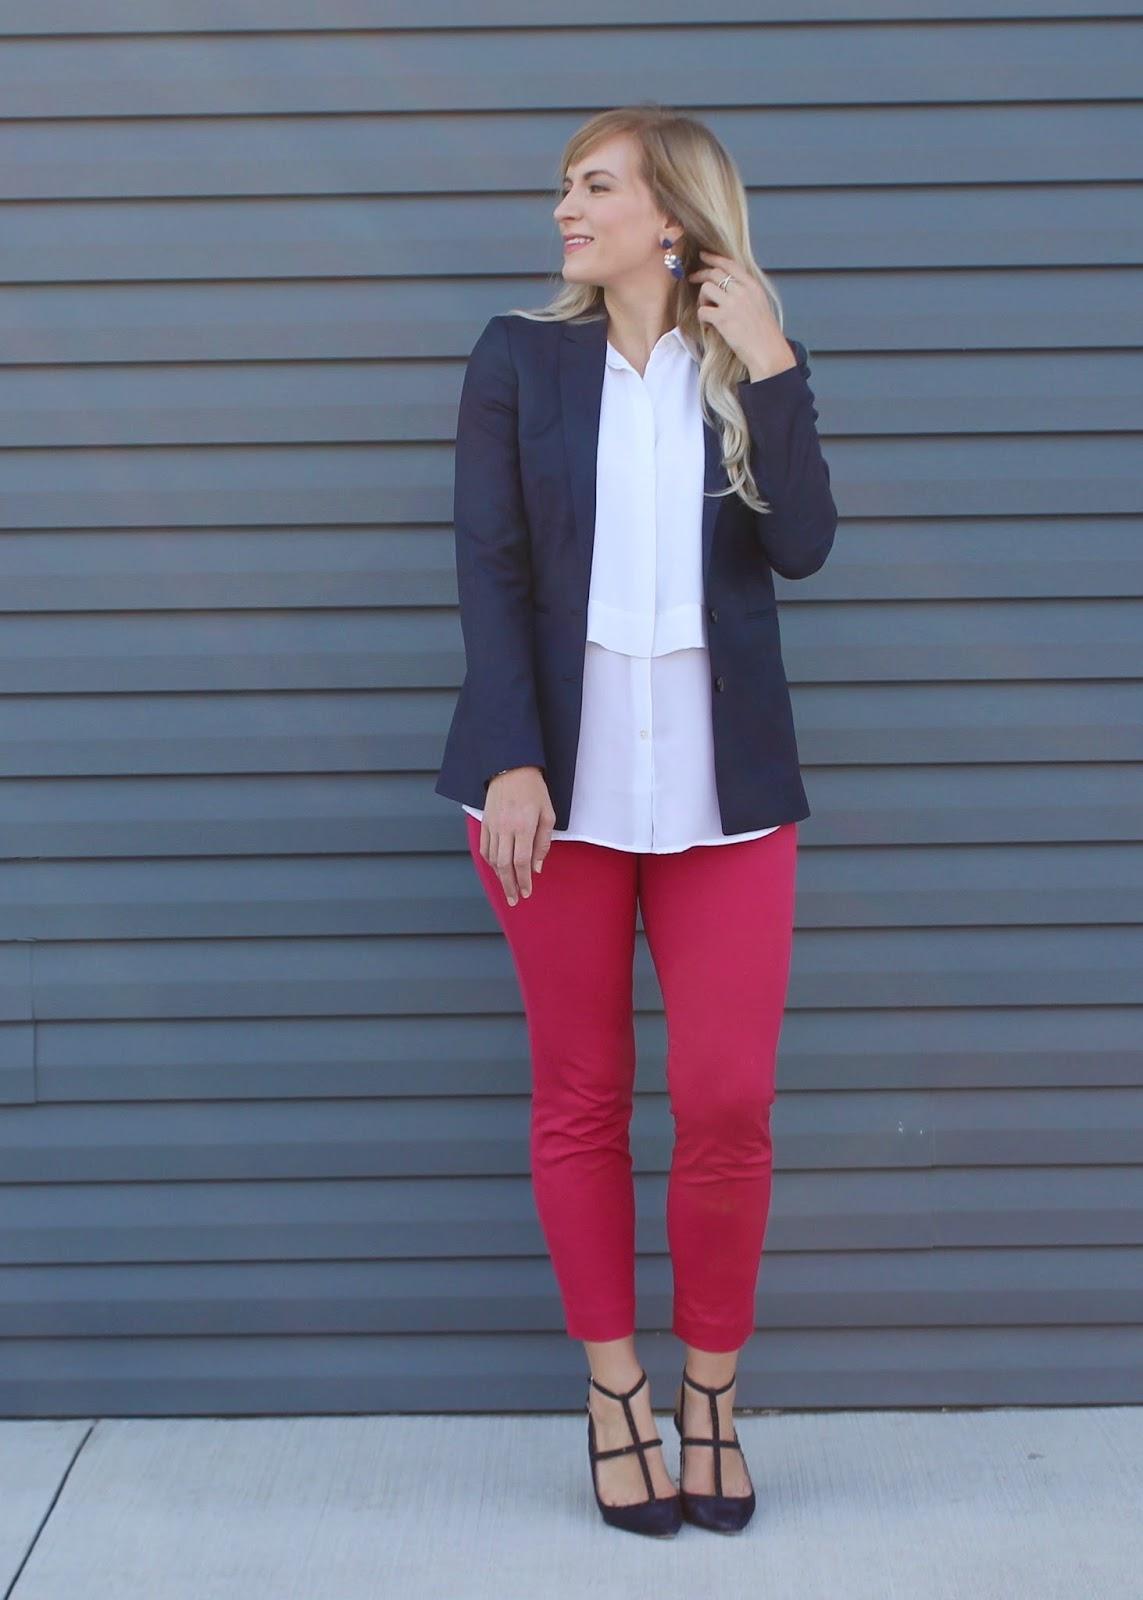 navy blazer and pink pants